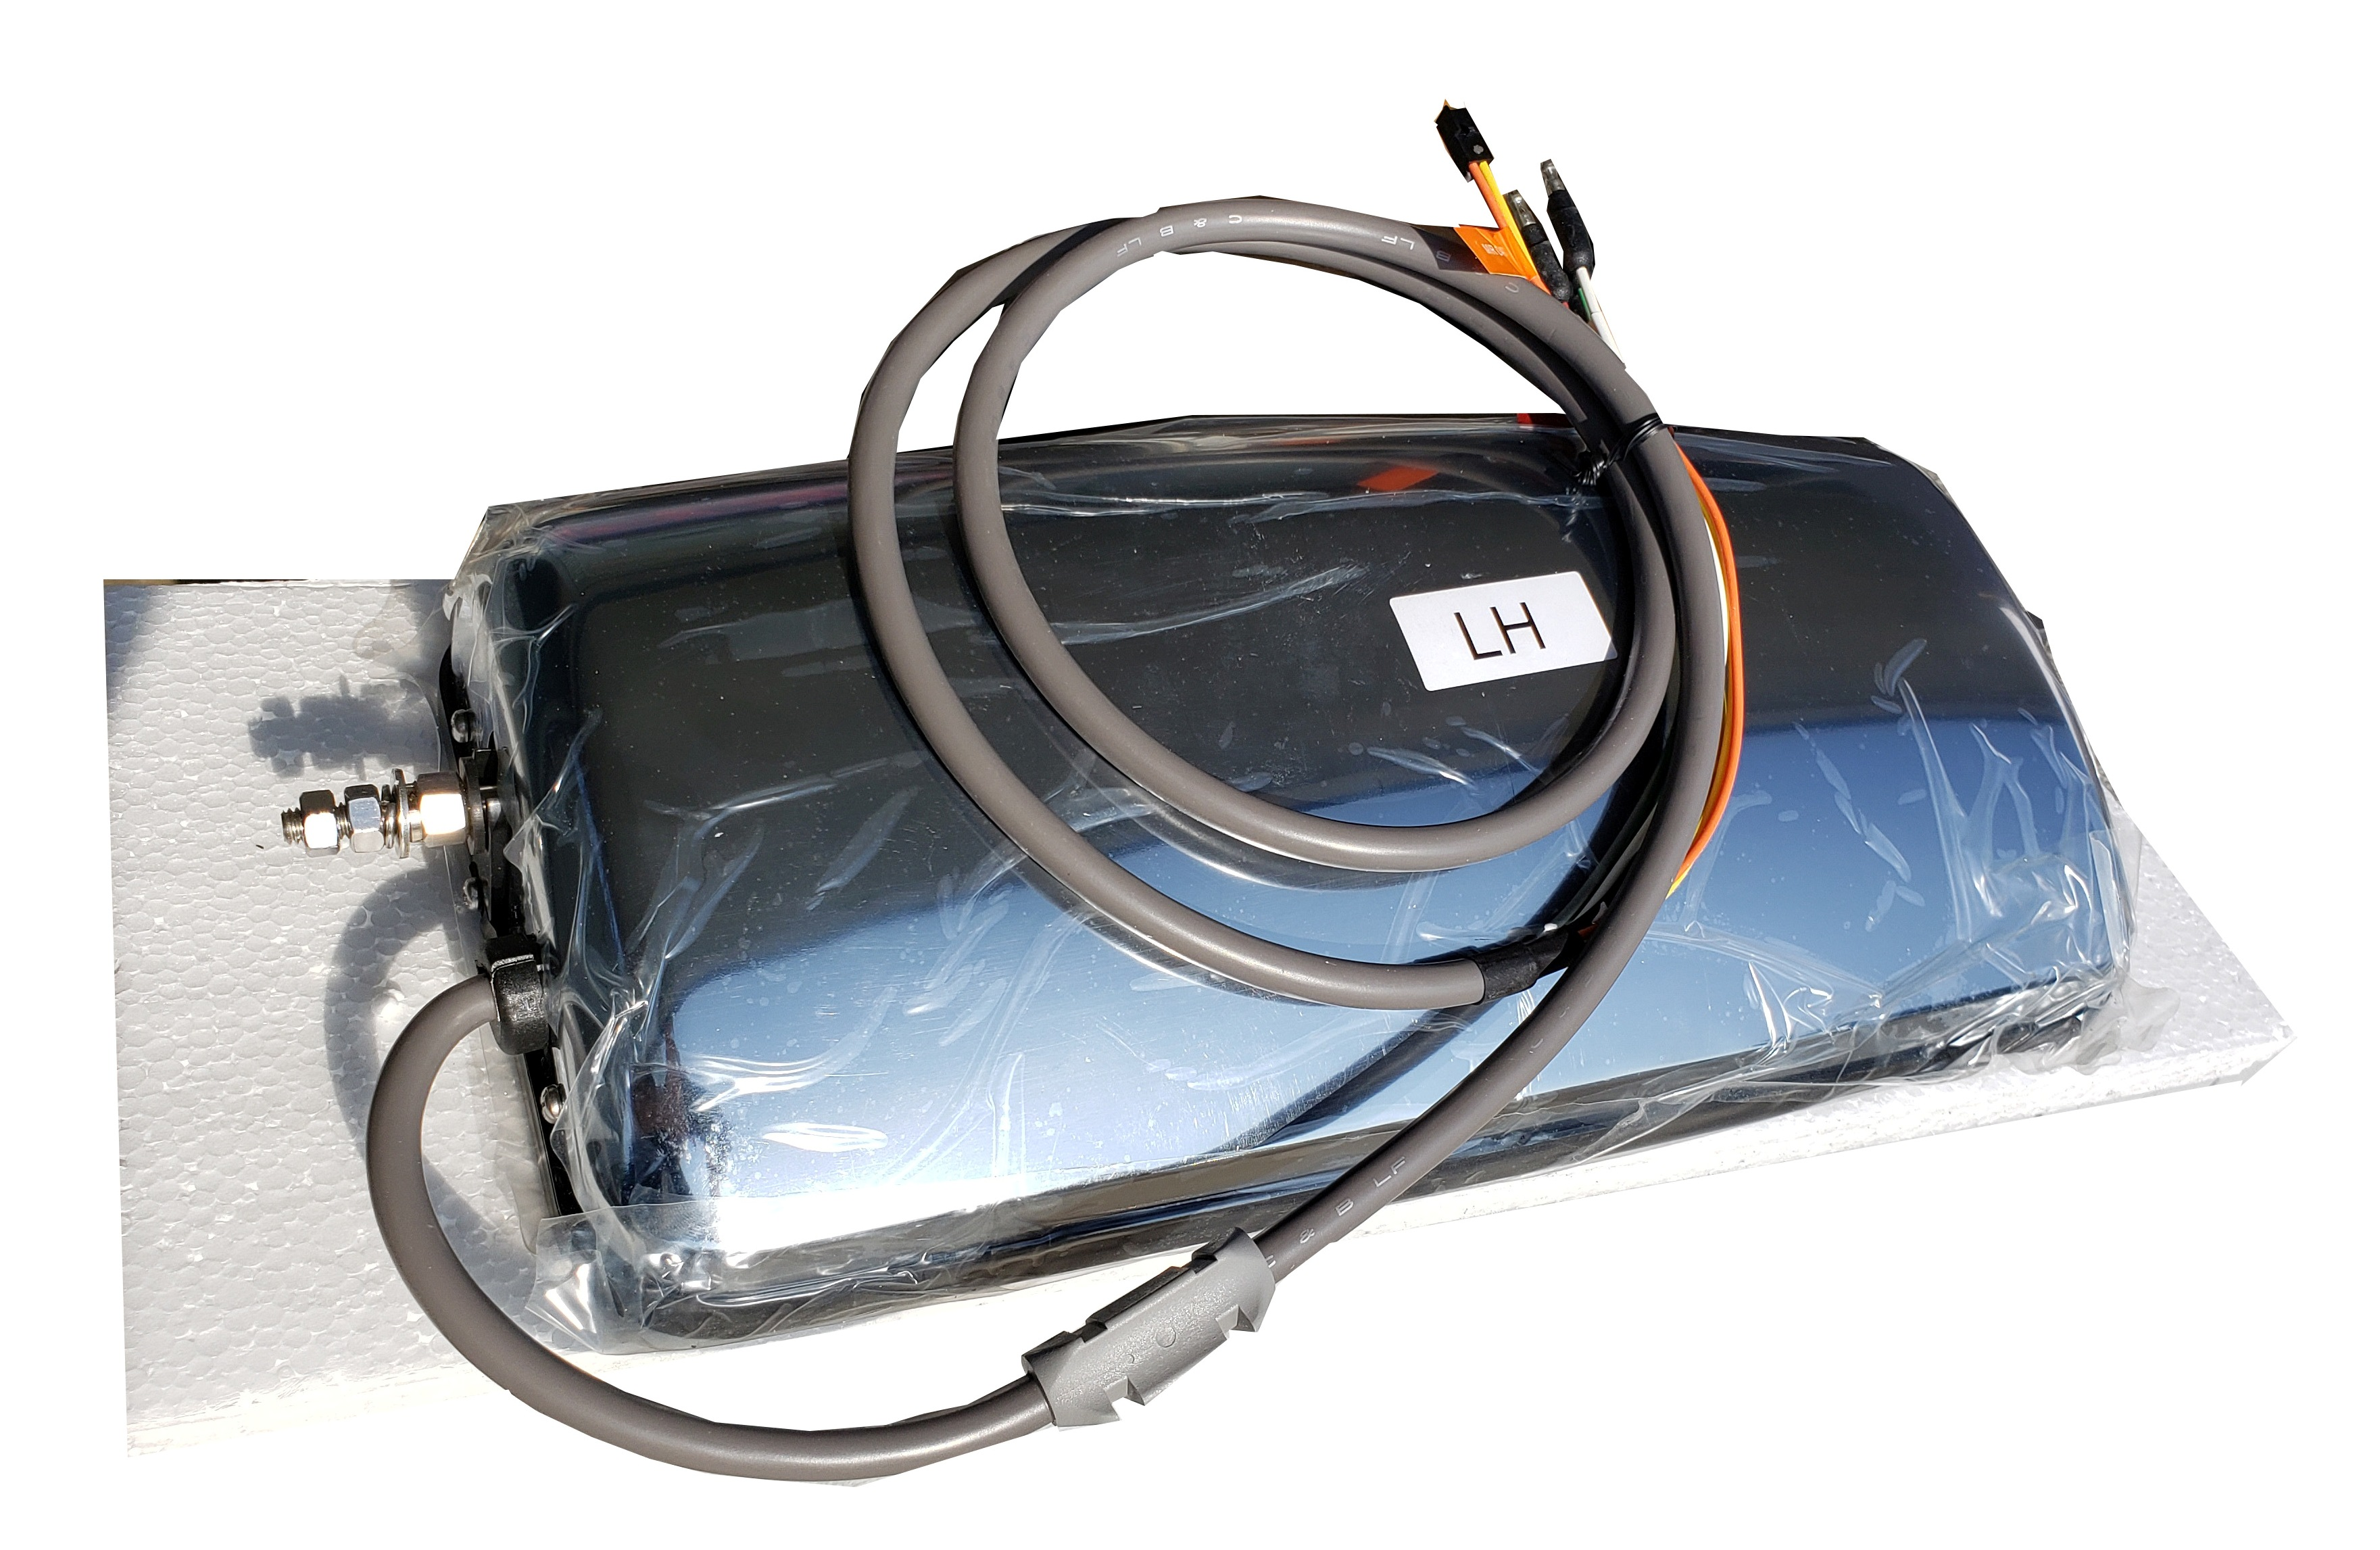 Peterbilt 389 Heated West Coast Motor Mirror w/ Oat Sensor (L/H)